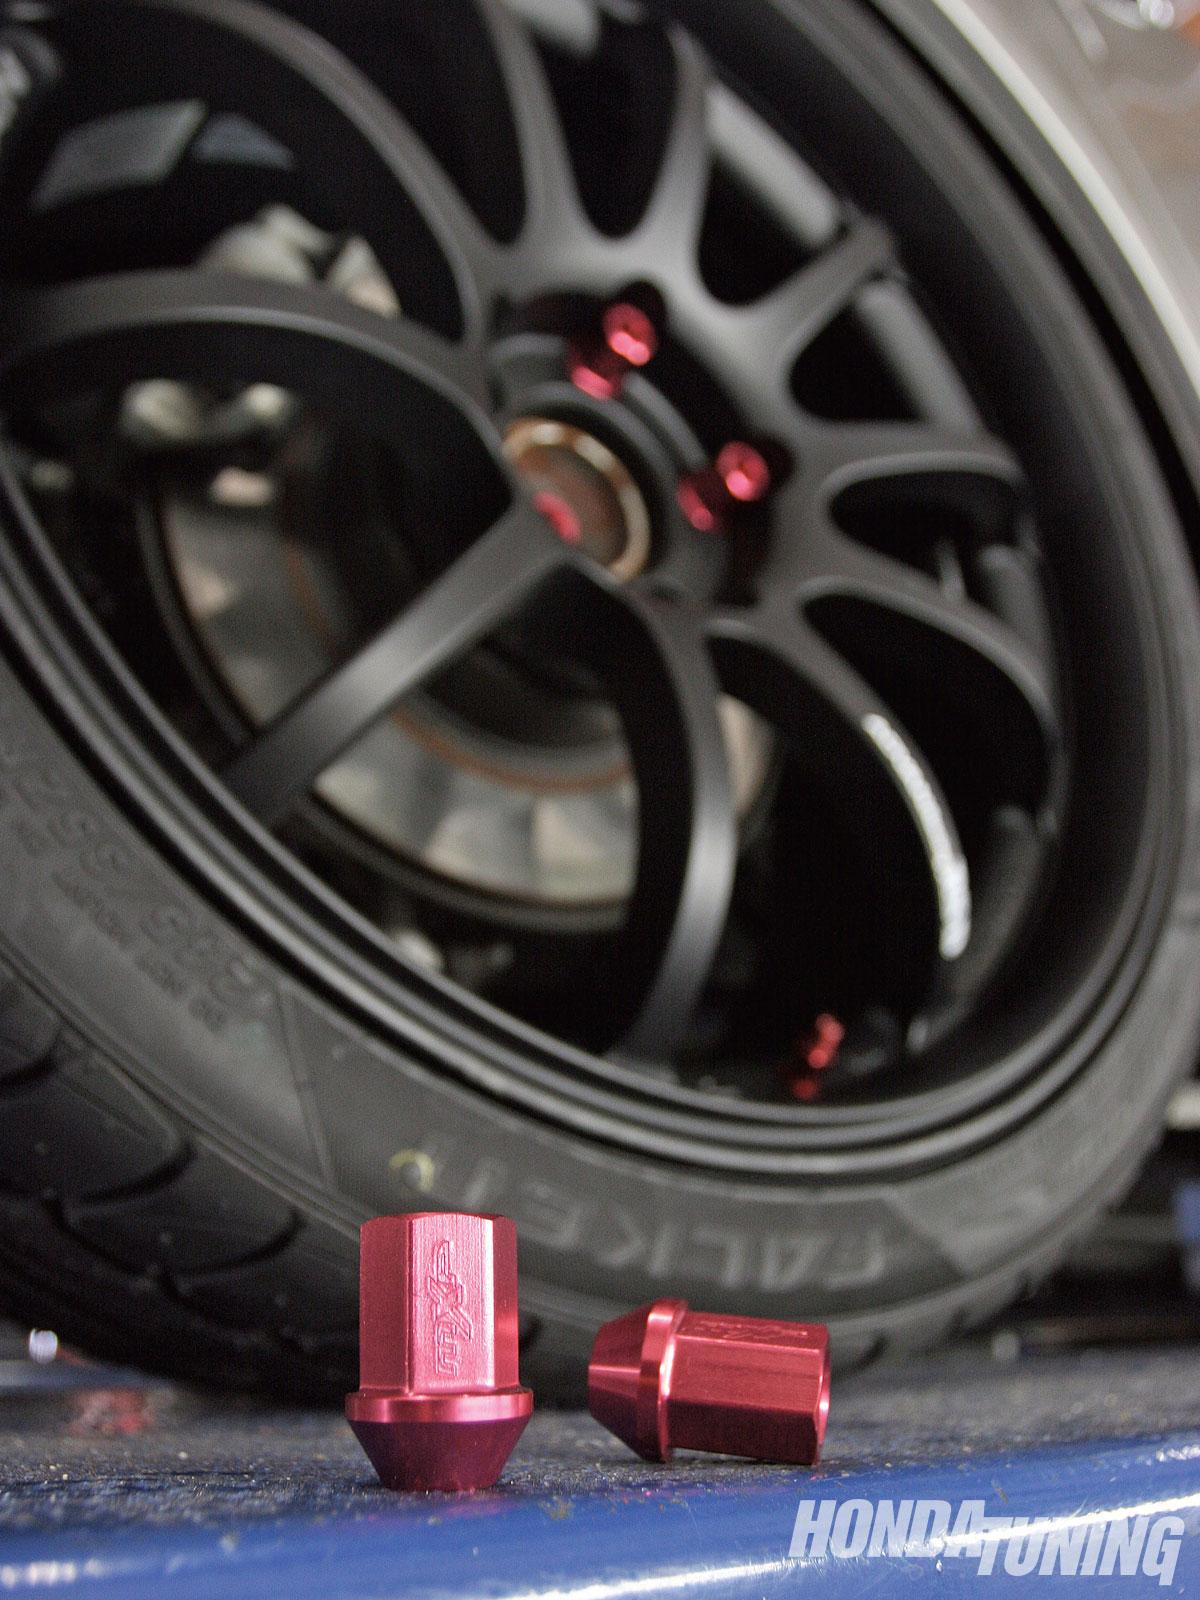 2010 Acura TSX - Honda Tuning Magazine